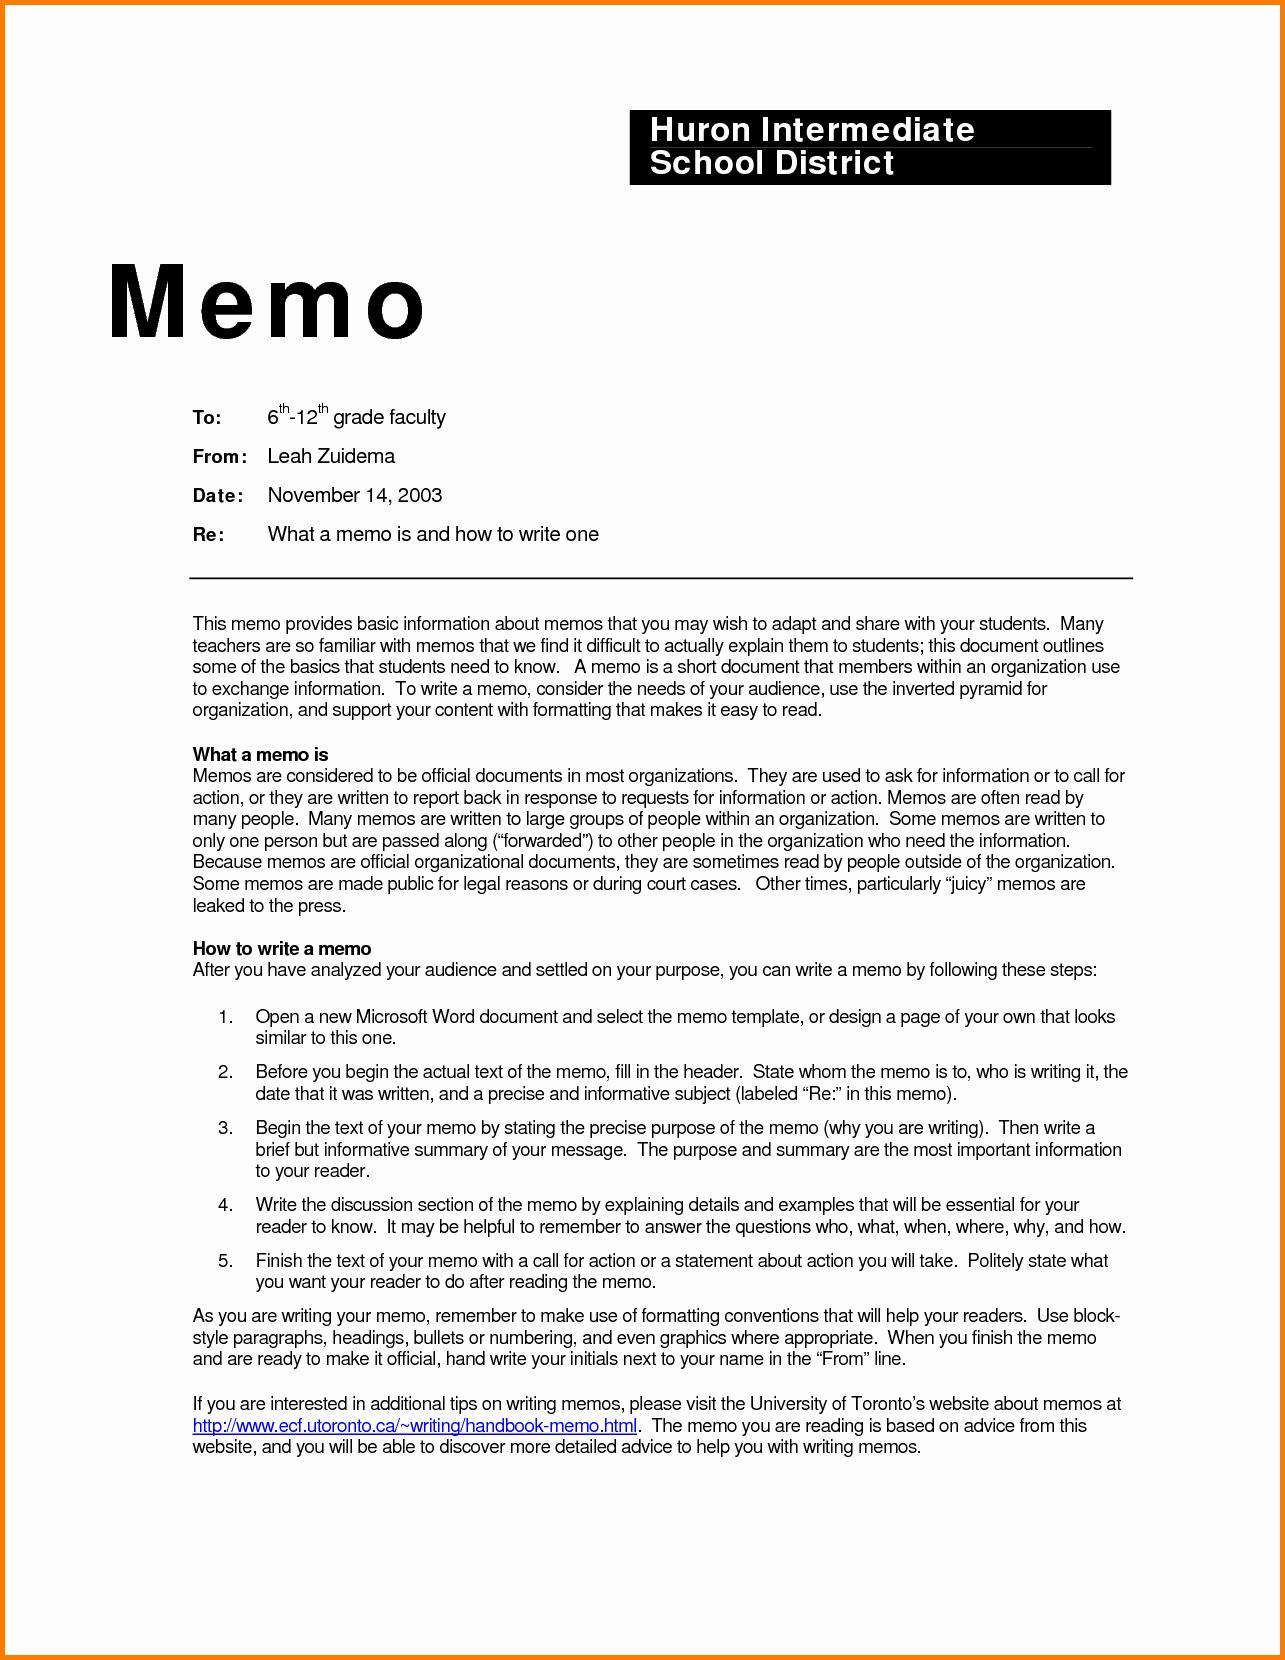 How to Draft A Memo Beautiful 4 How to Write Business Memo